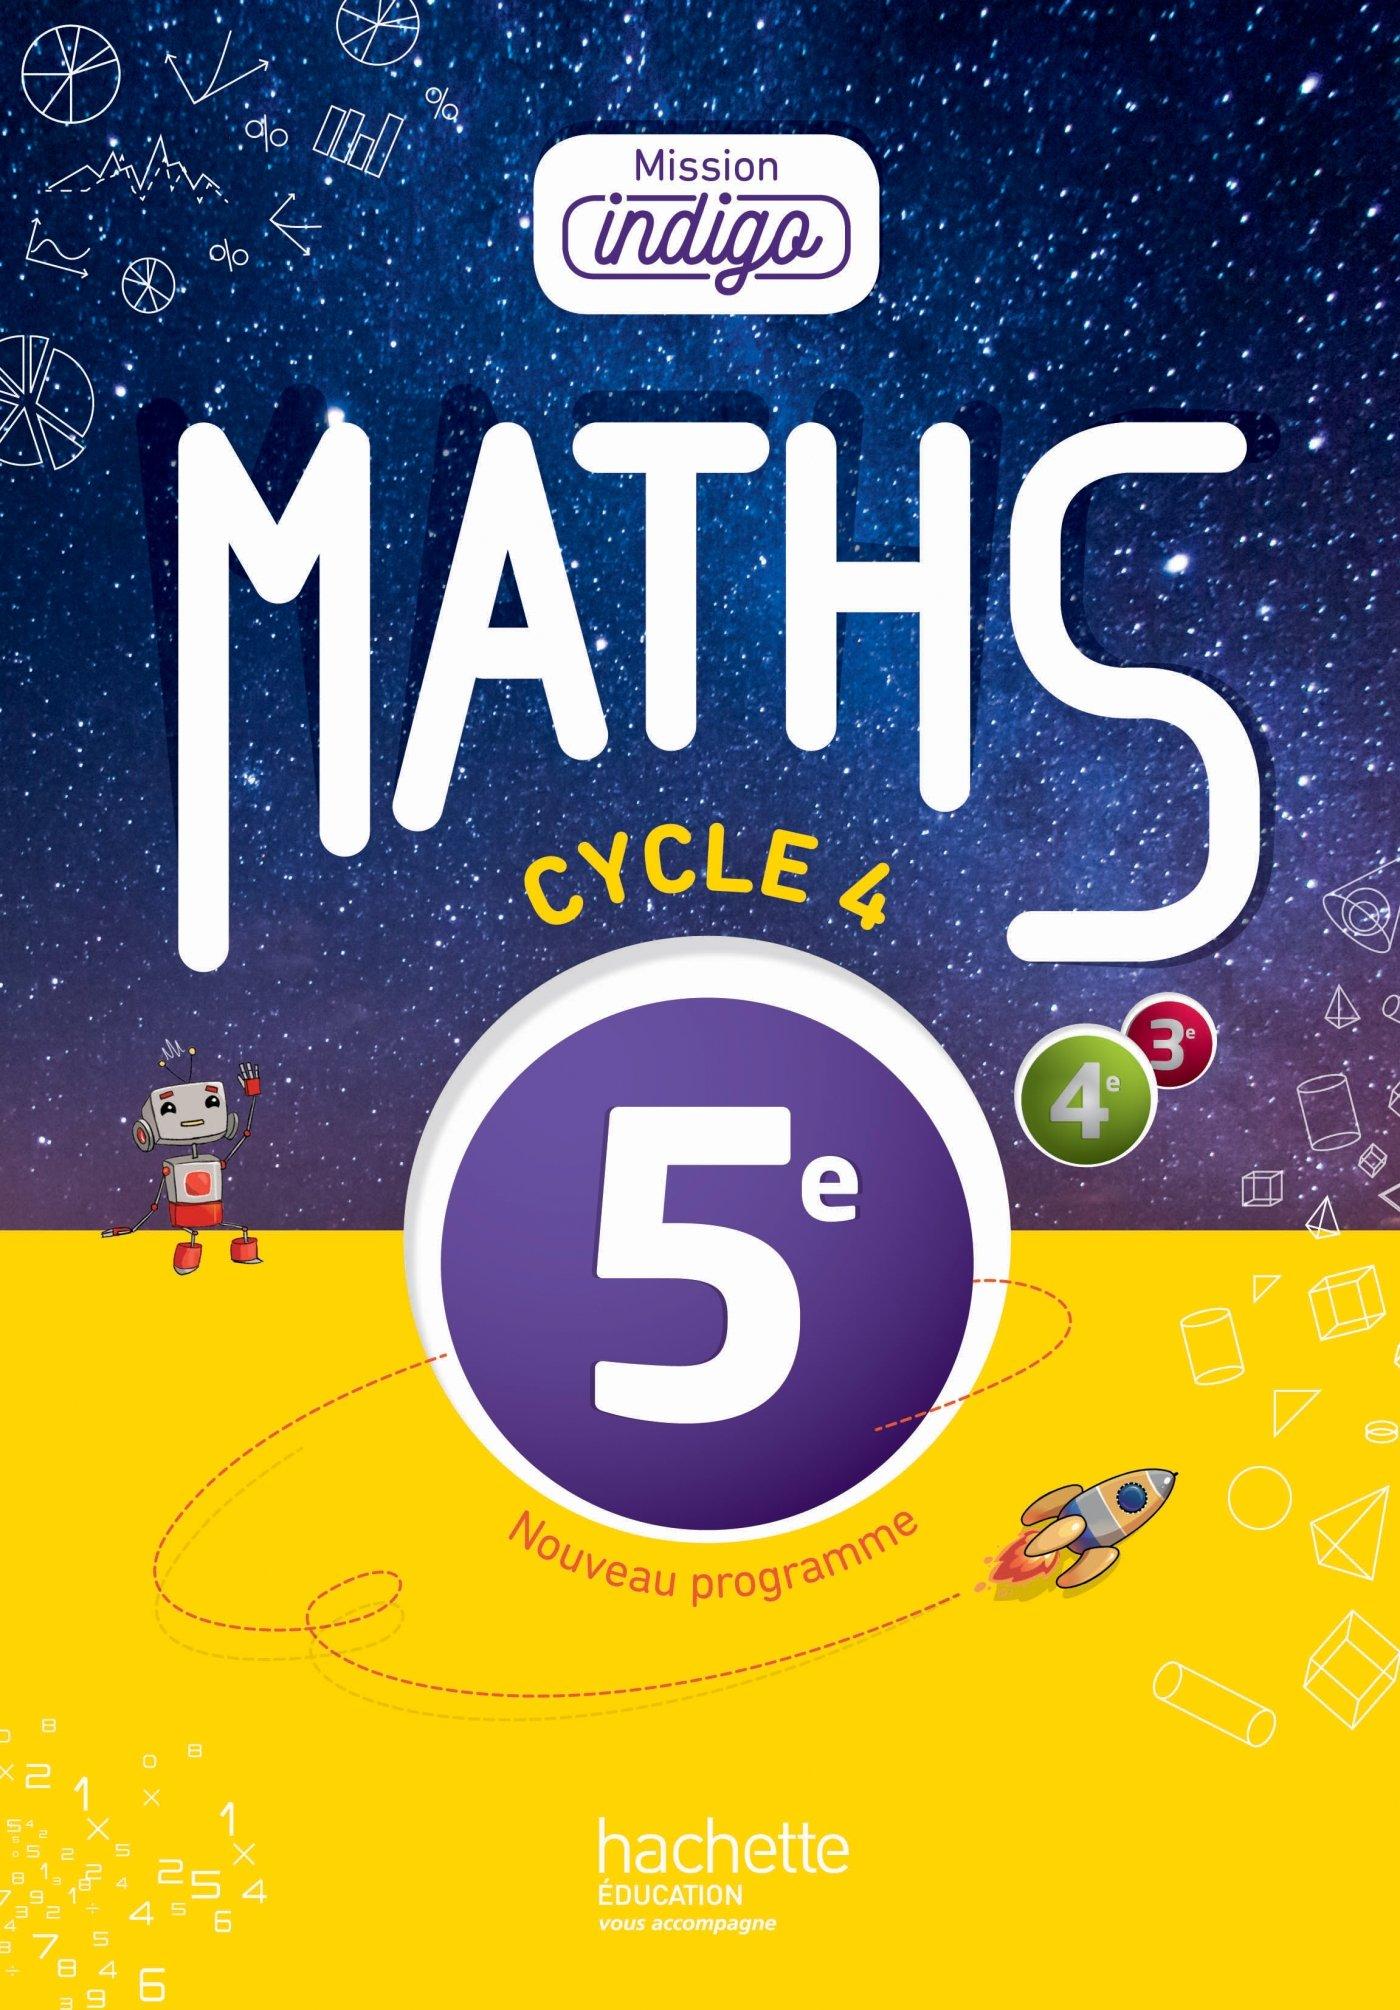 MISSION INDIGO MATHEMATIQUES CYCLE 4  5E - LIVRE ELEVE - ED. 2016 POCHE